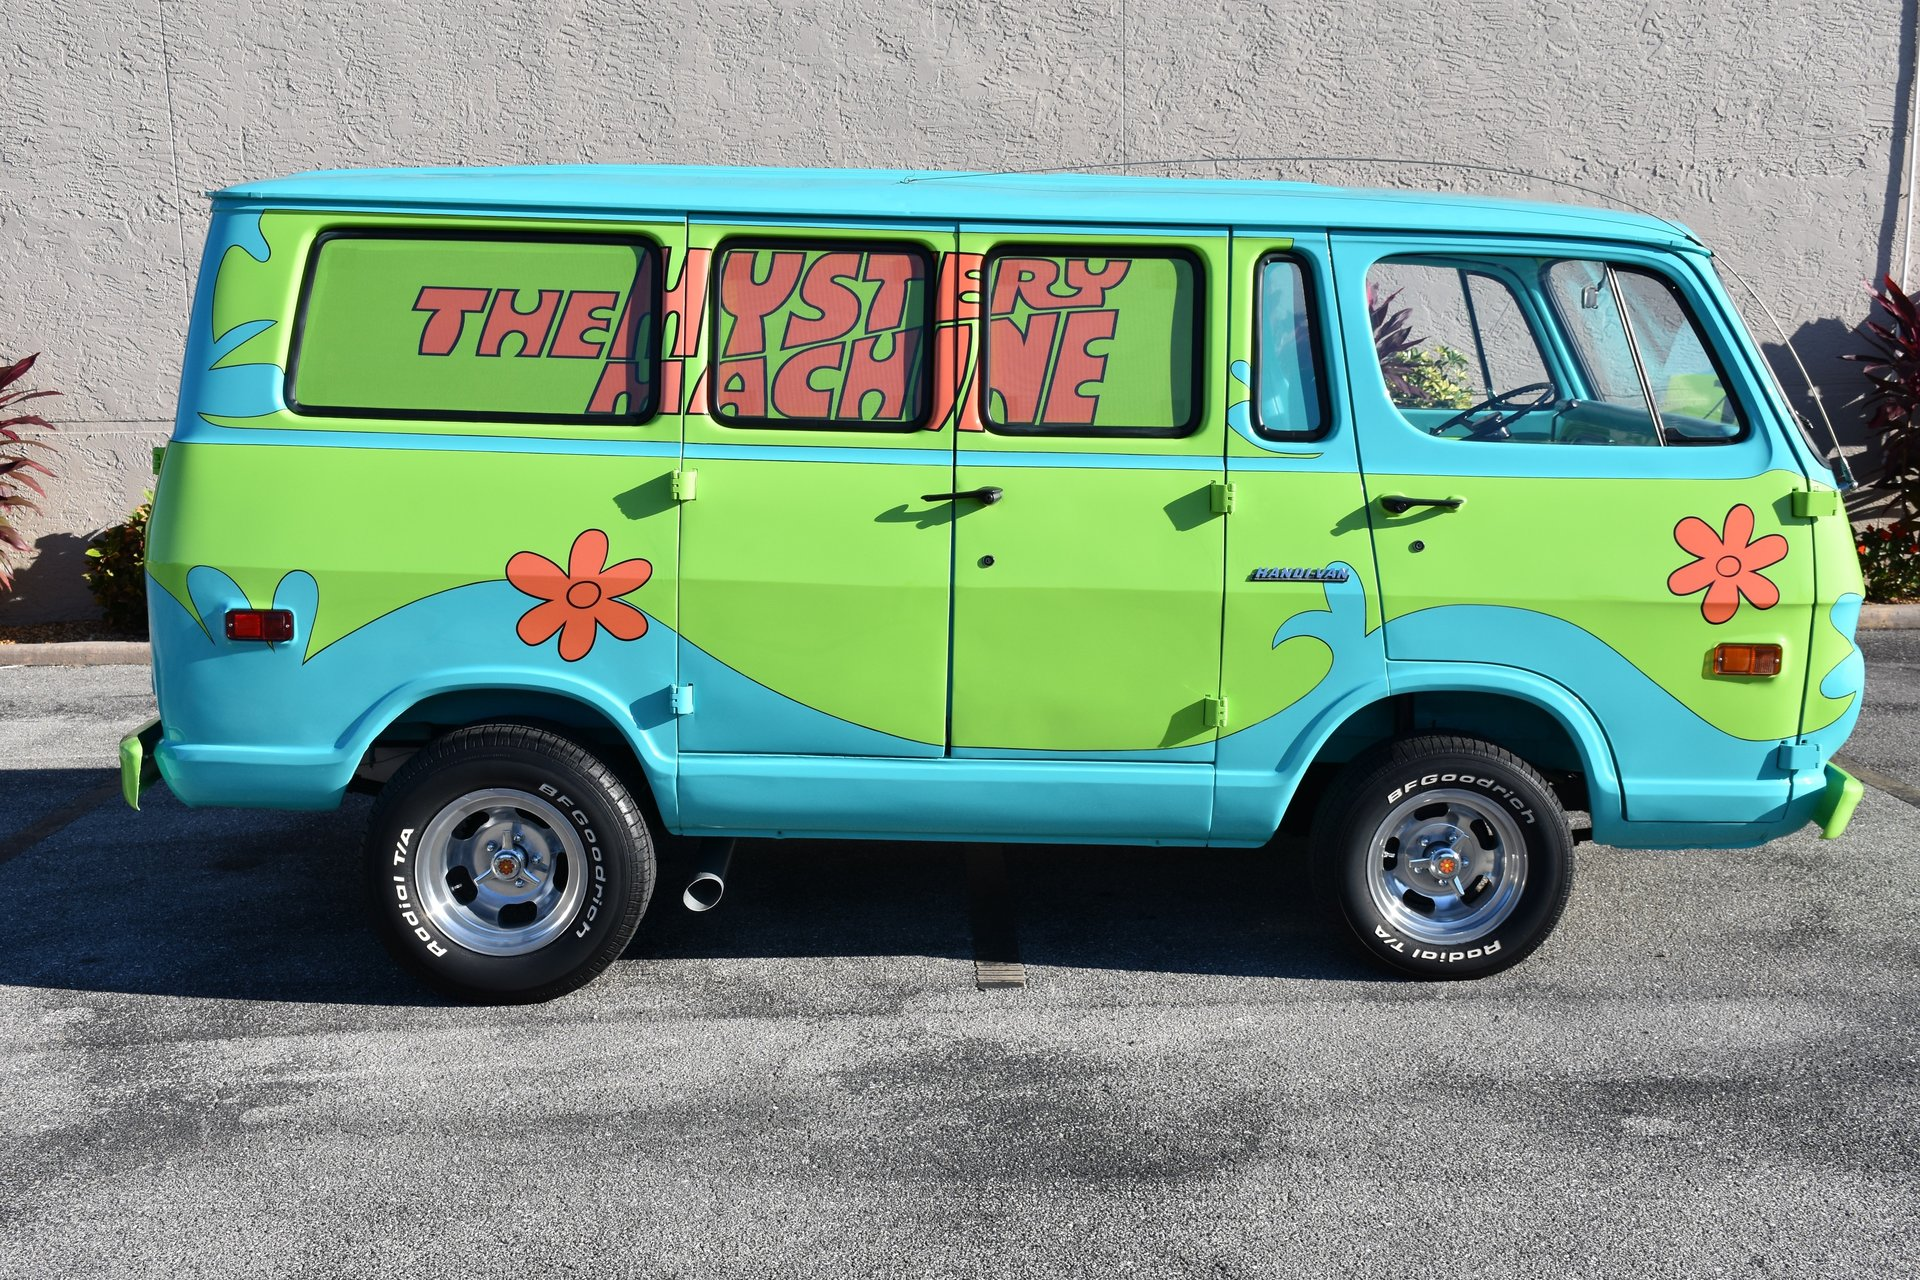 Poland Machinery Dealers Doo Mail: 1969 Z Movie Car Scooby Doo Mystery Machine For Sale